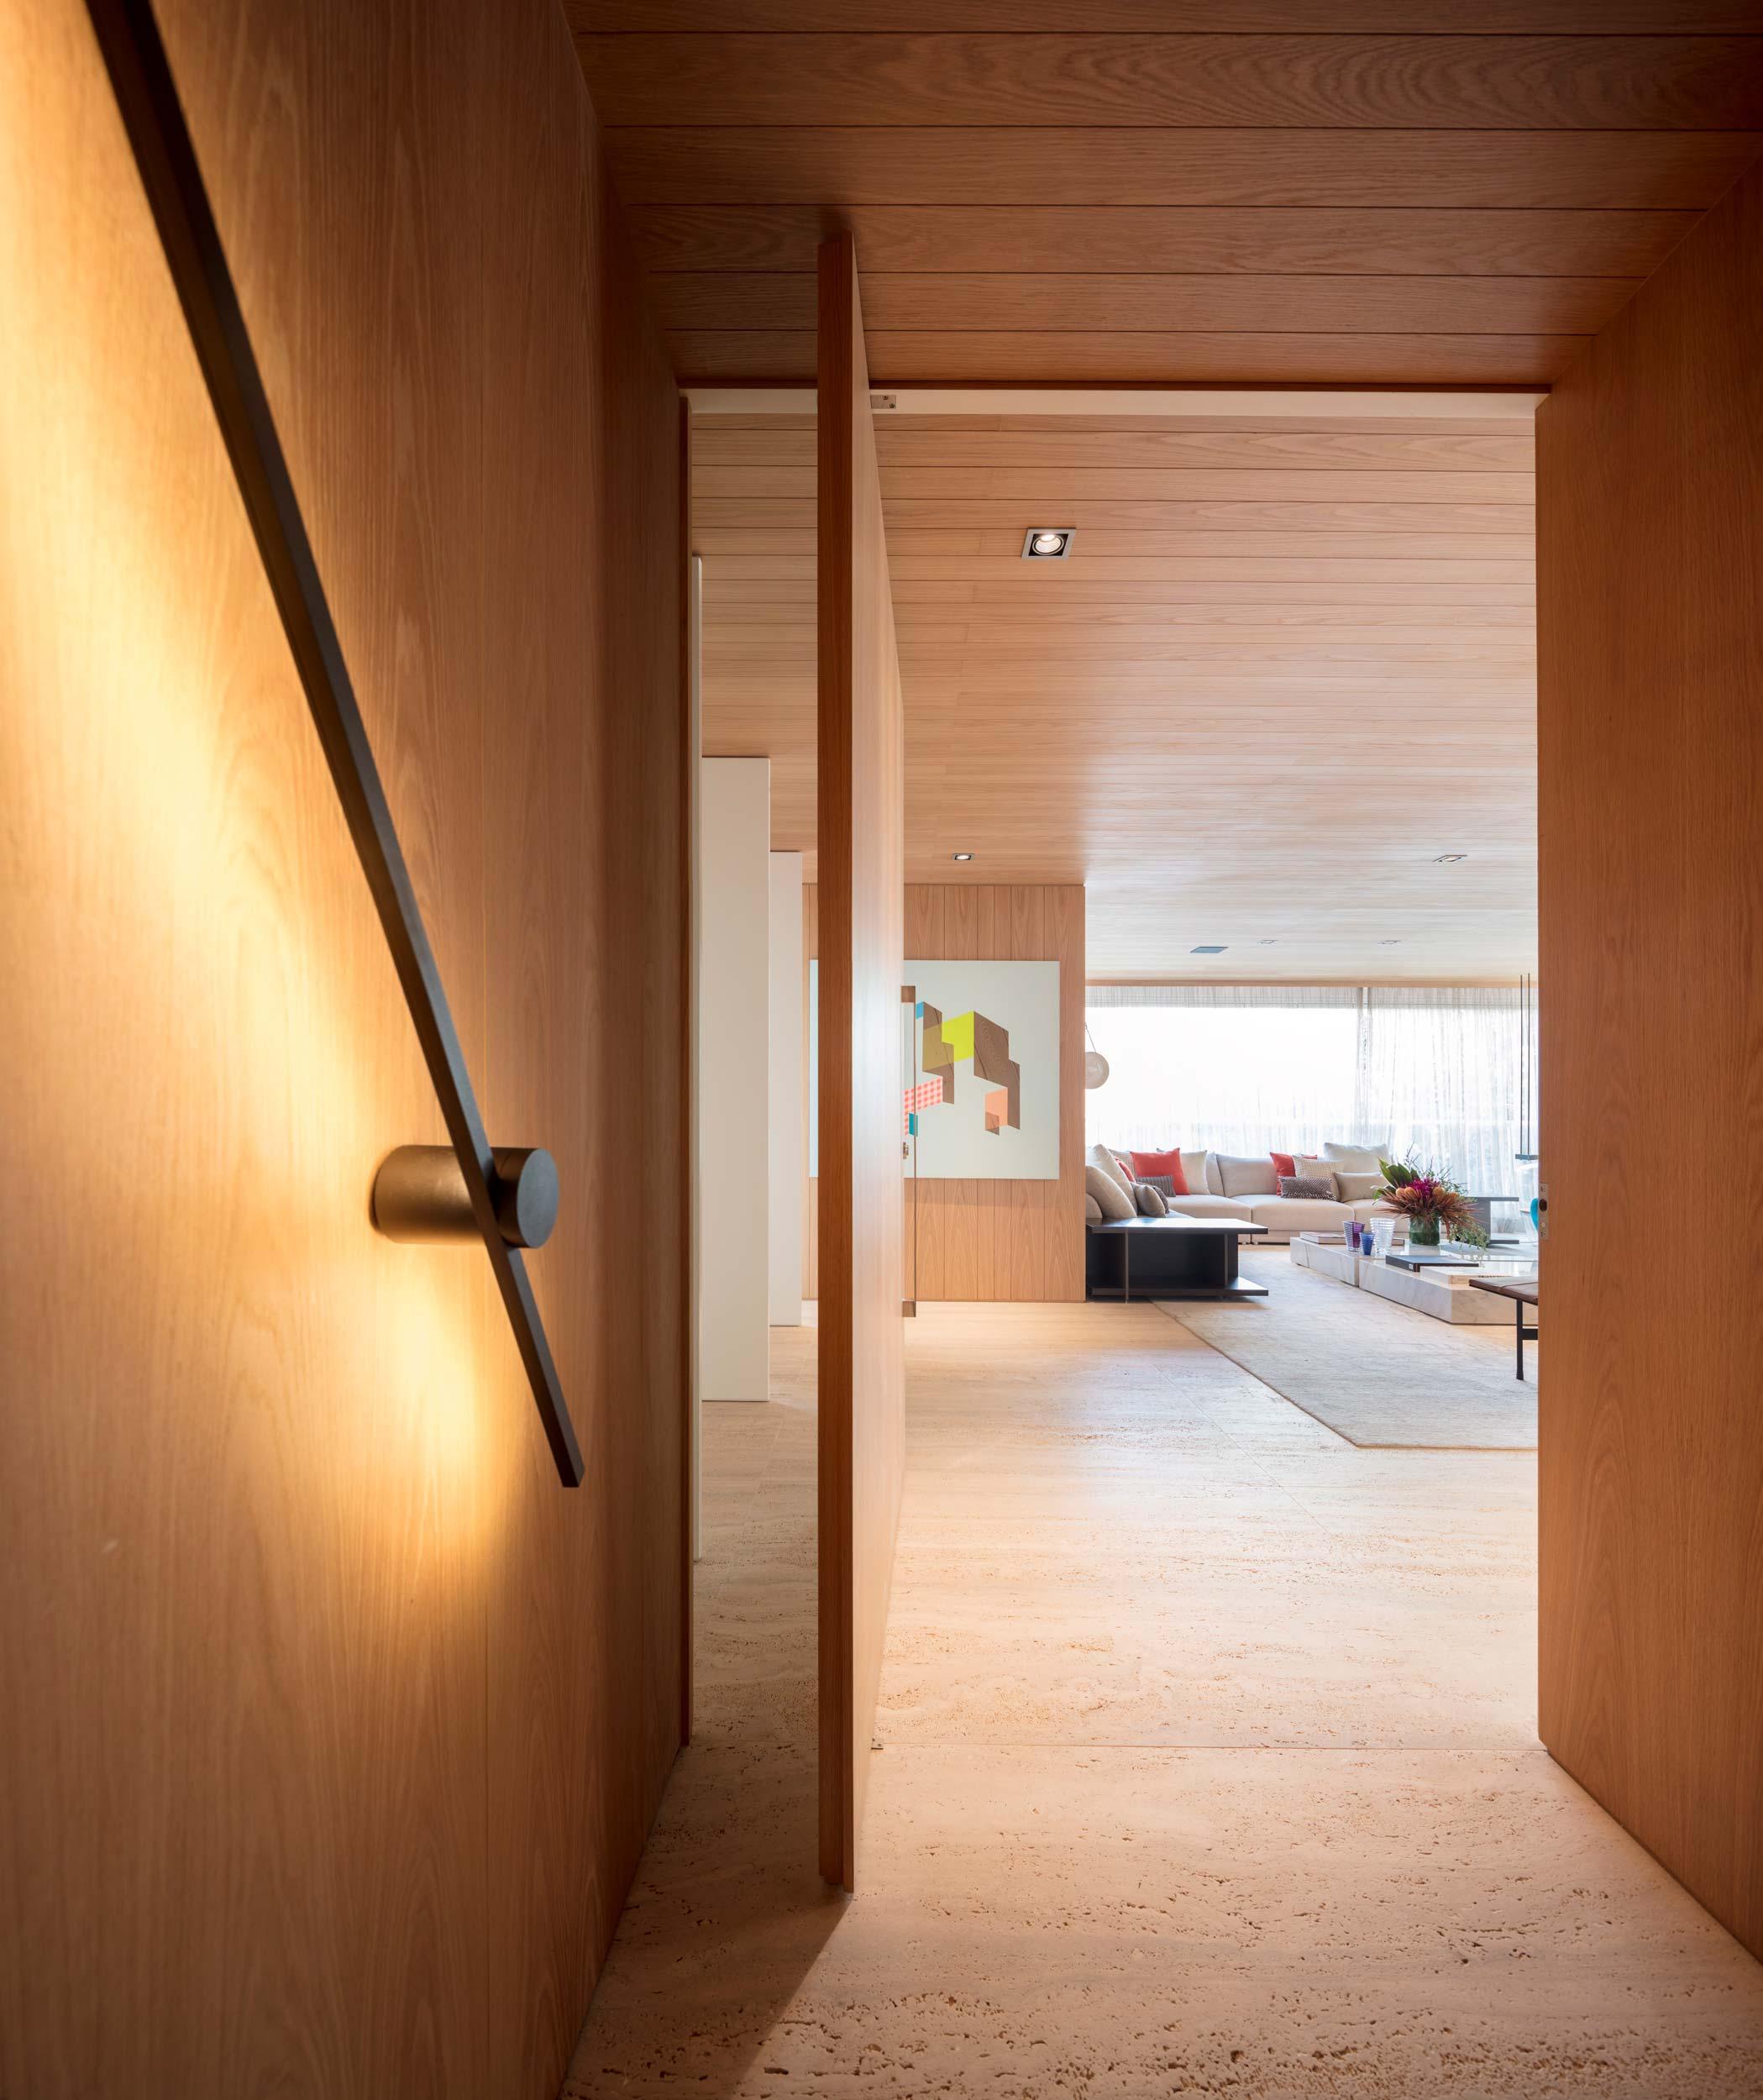 projeto-eretz-fernanda-marques-arquiteta-7.JPG